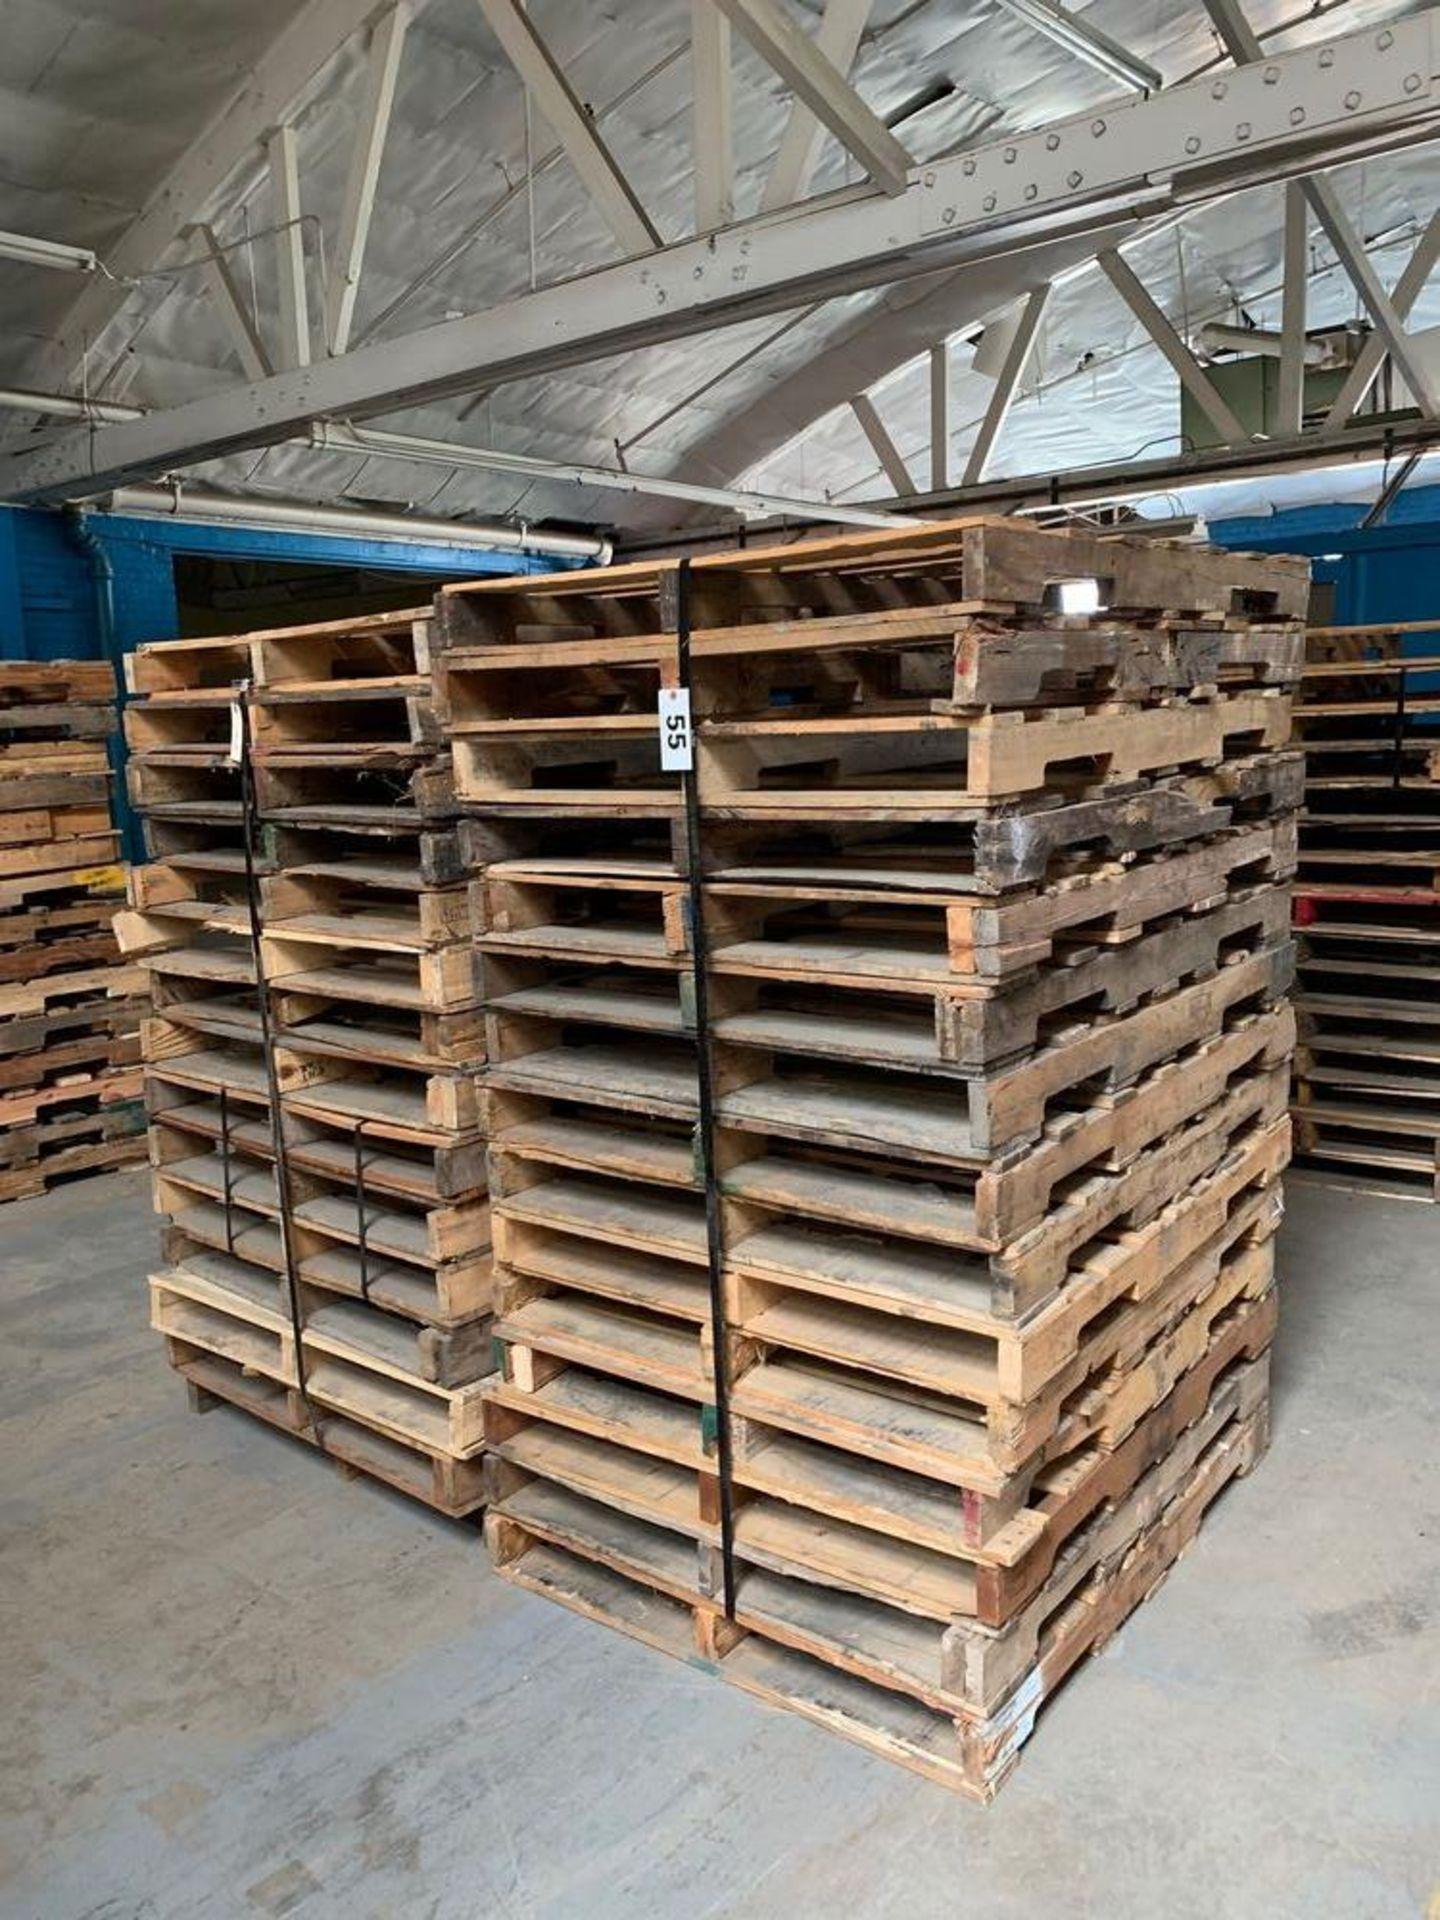 Lot 55 - Lot of Skids (2 stacks)